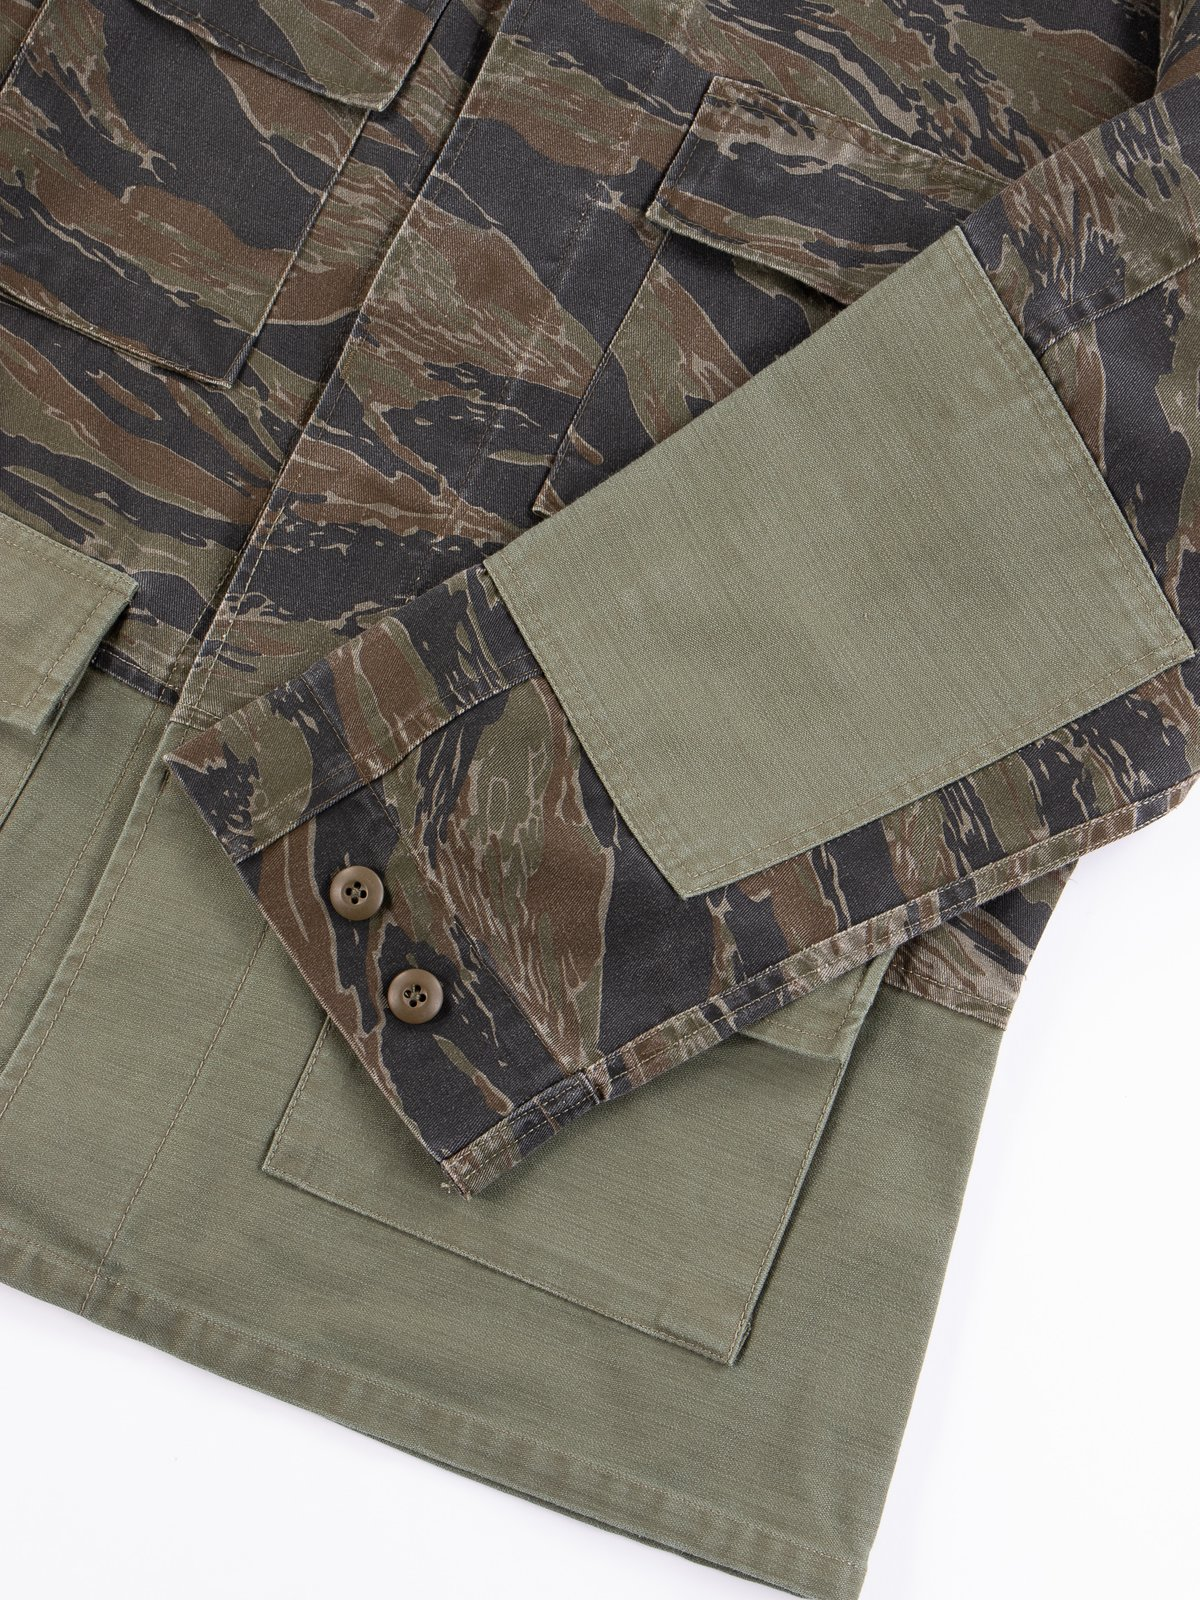 Reworks Camo/Olive Field Jacket - Image 5